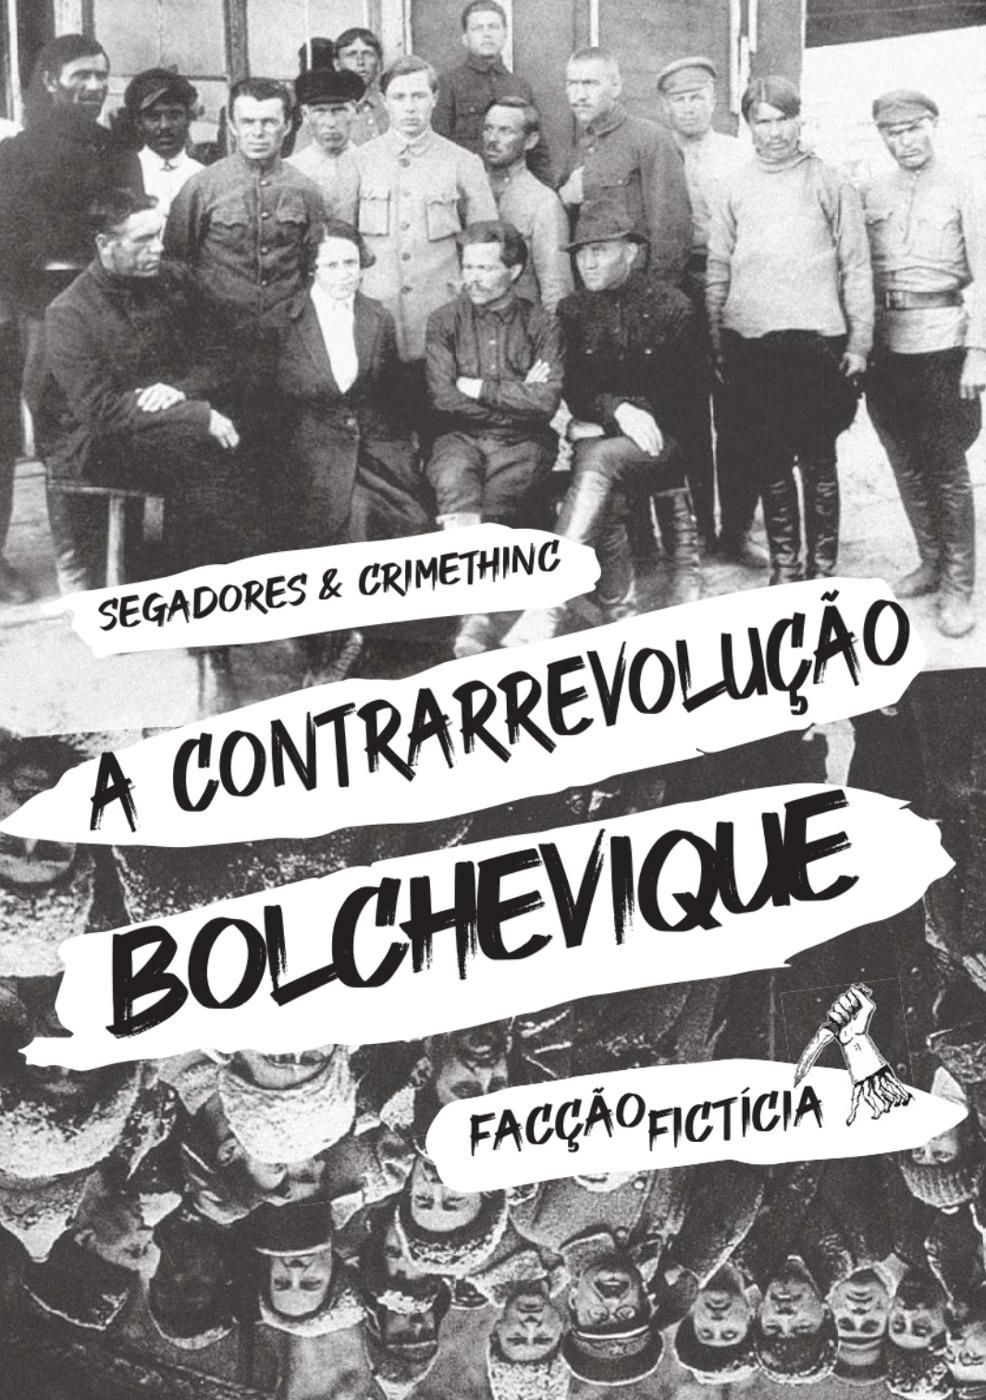 Photo of 'A Contrarrevoluçao bolchevique' front cover